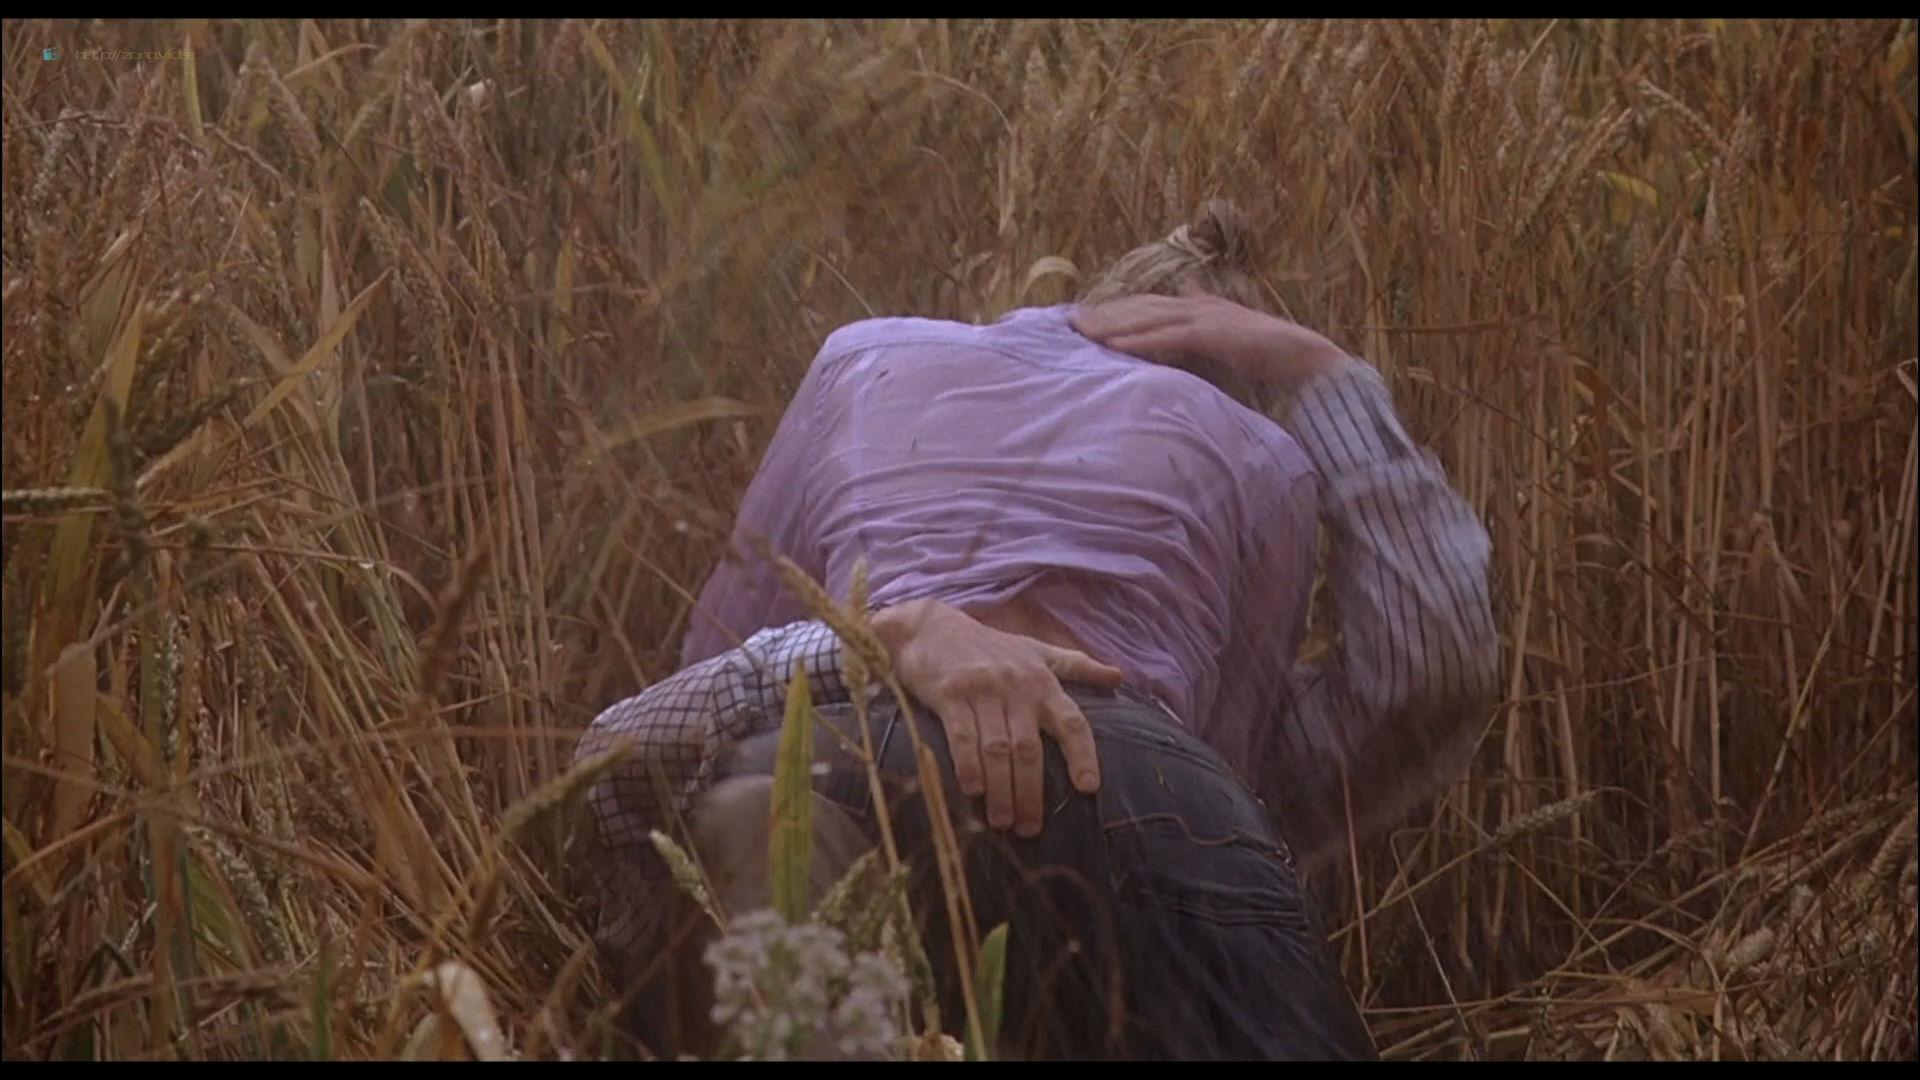 Scarlett Johansson see through and sex - Match Point (2005) HD 1080p BluRay (12)